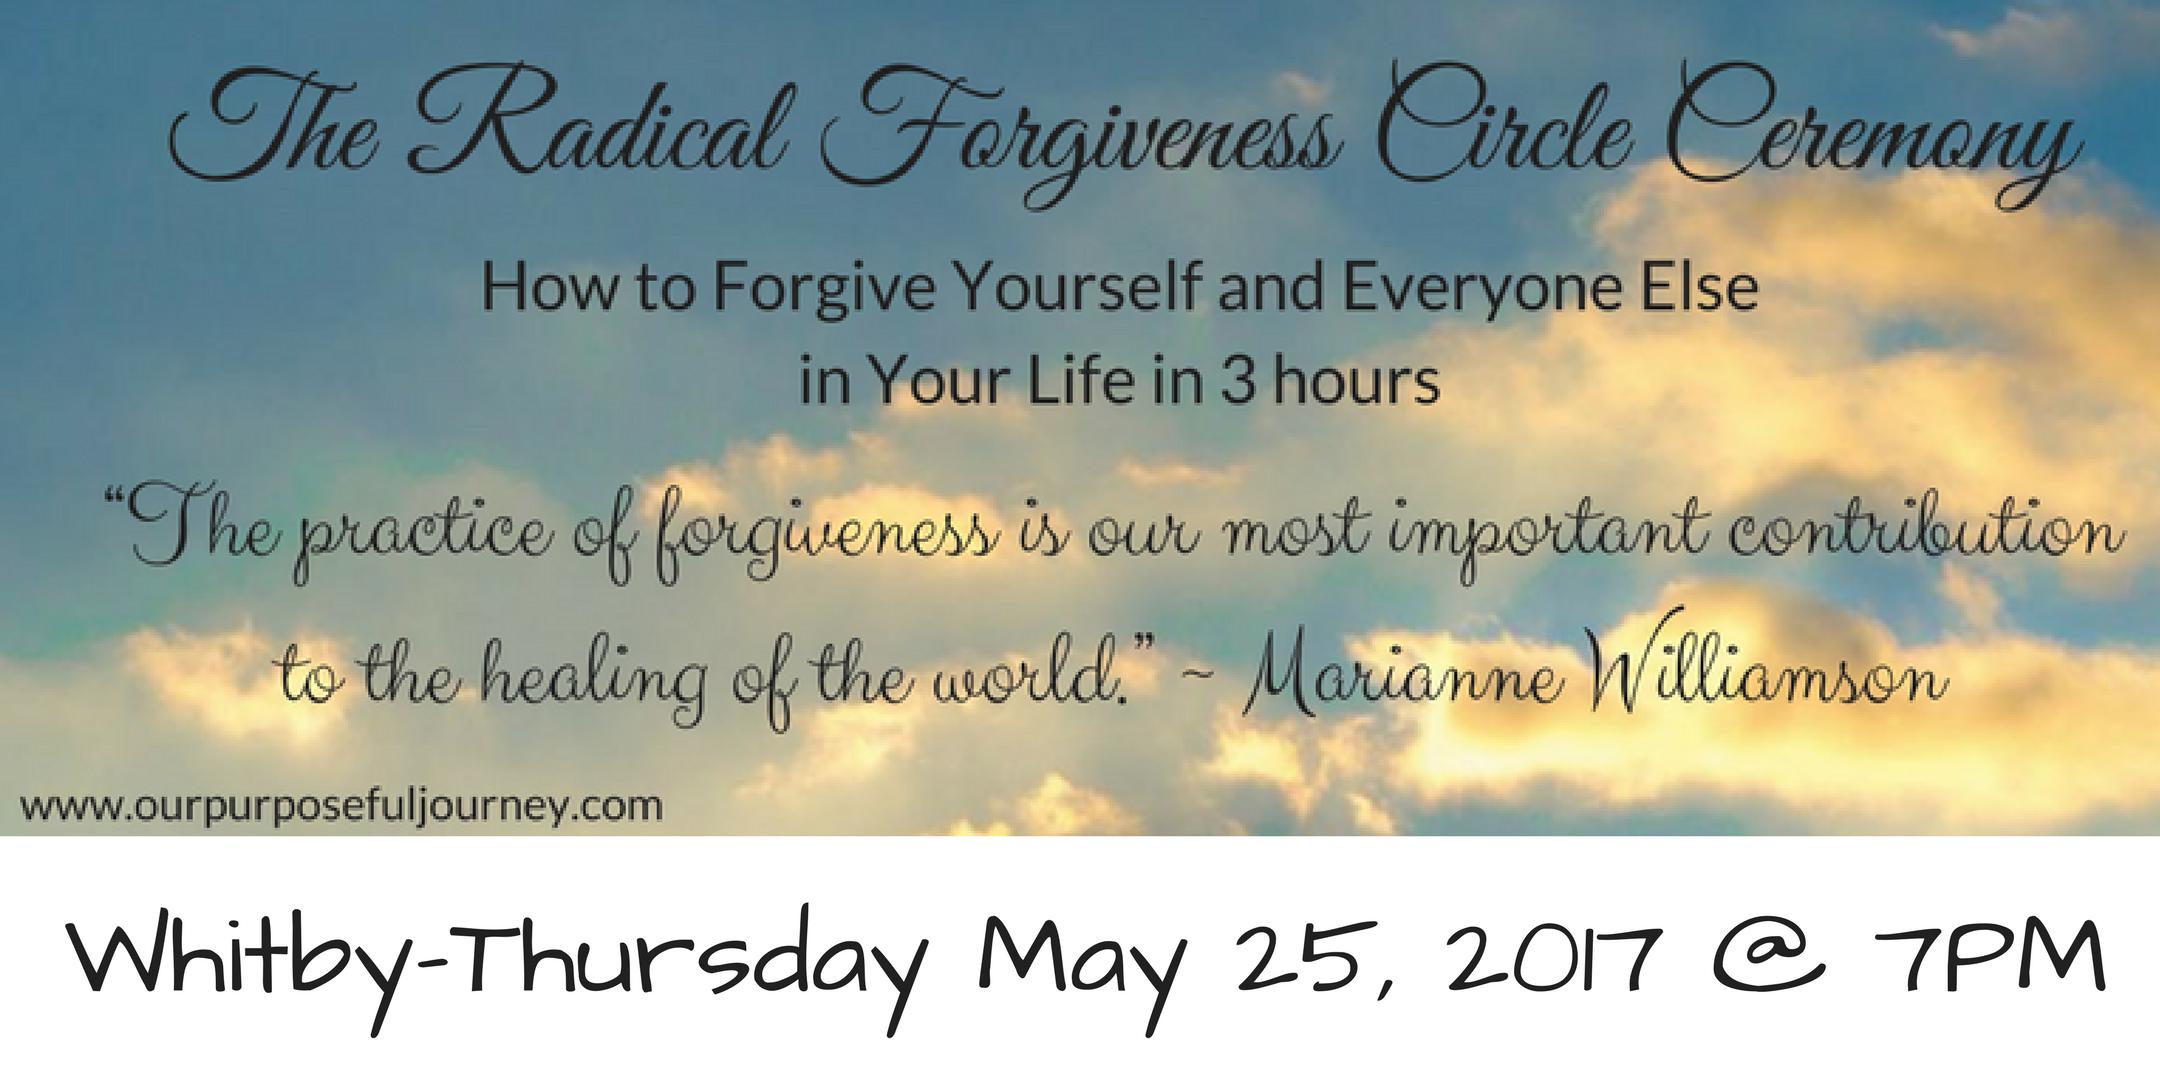 The Radical Forgiveness Circle Ceremony